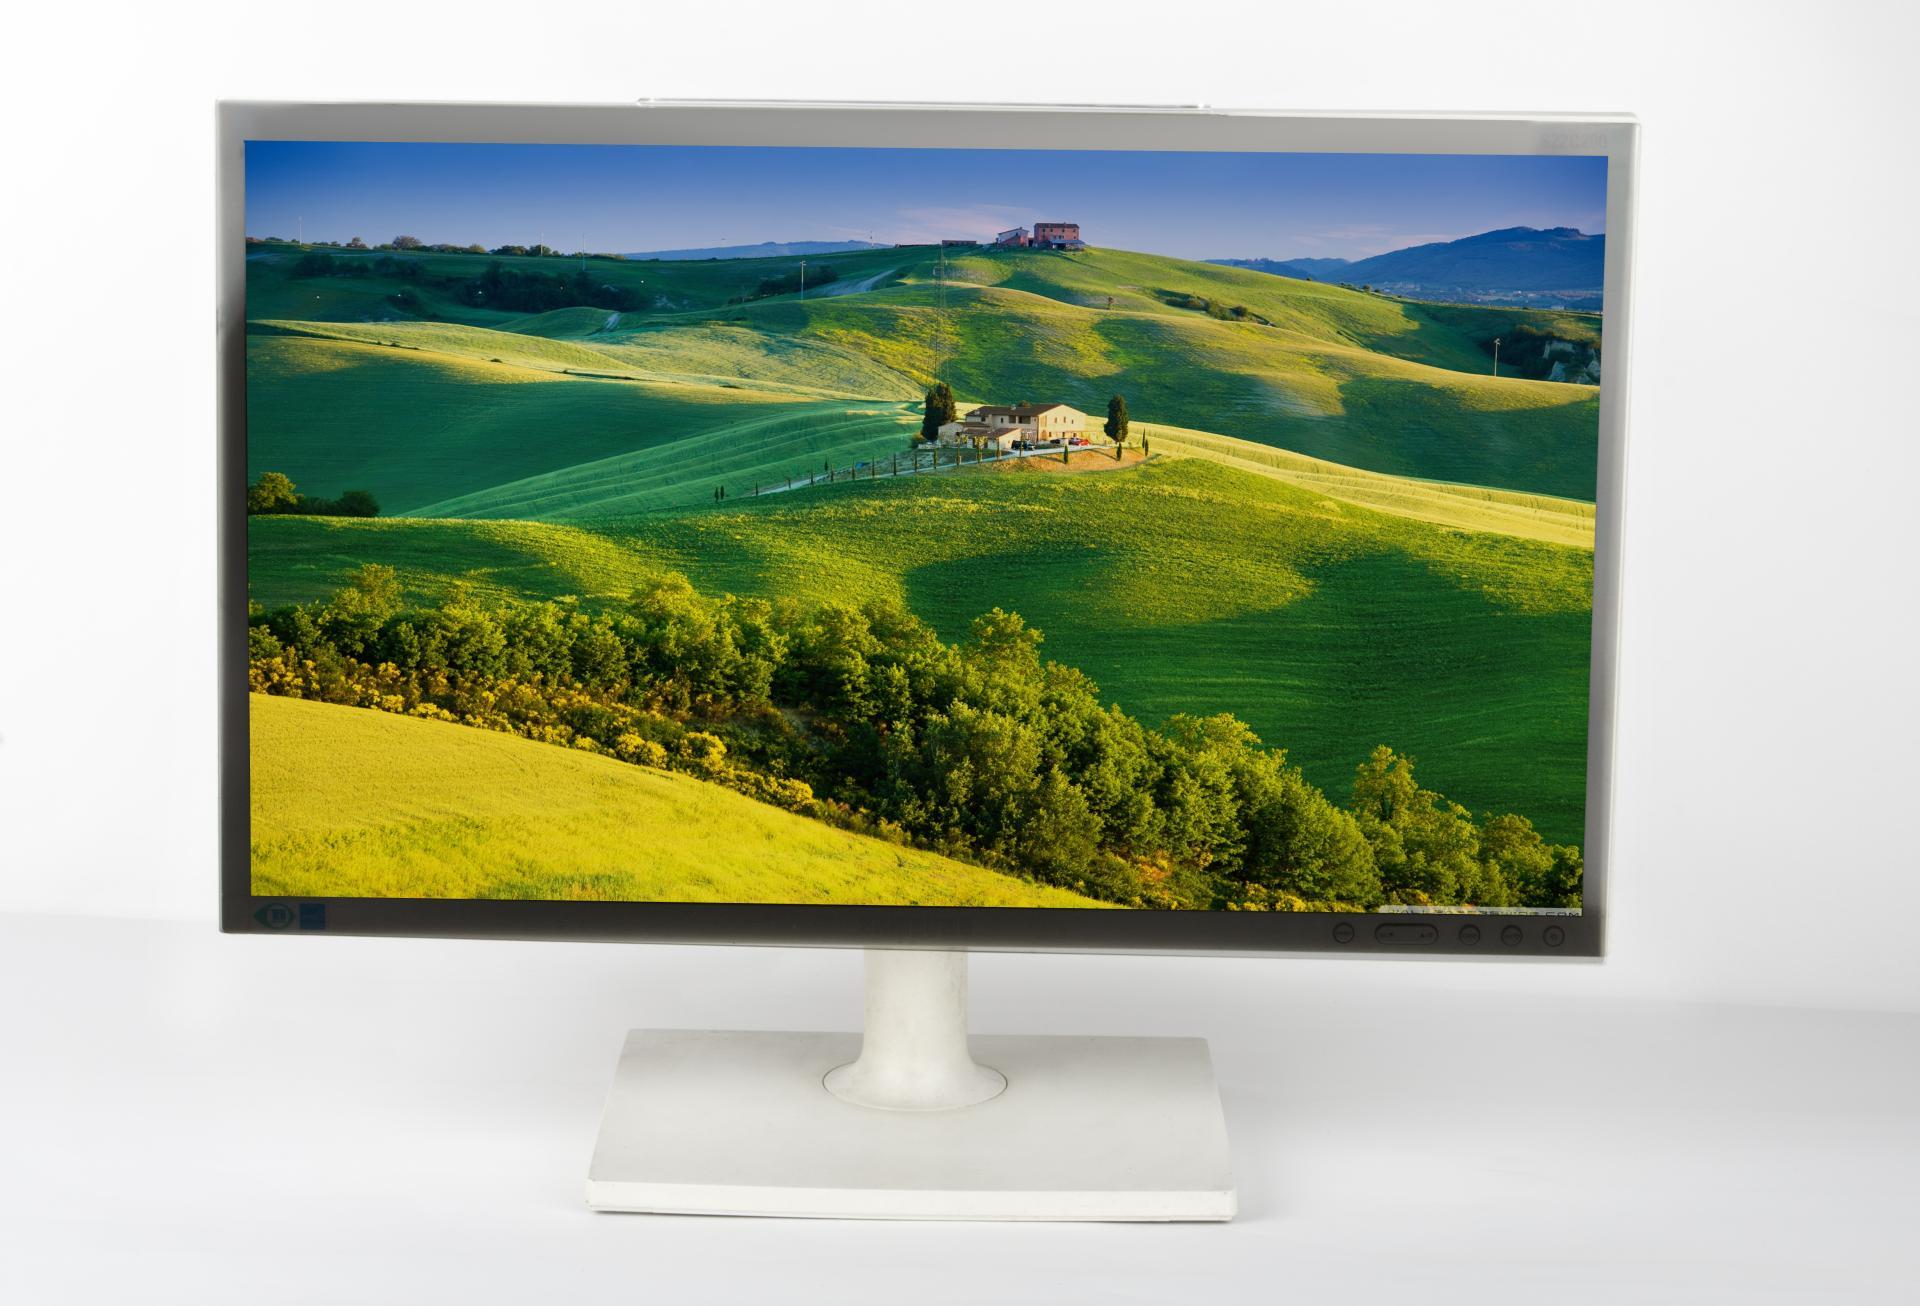 Anti SpyAcrylic Shock Proof 20'' Removable LaptopPrivacy Screen Filters